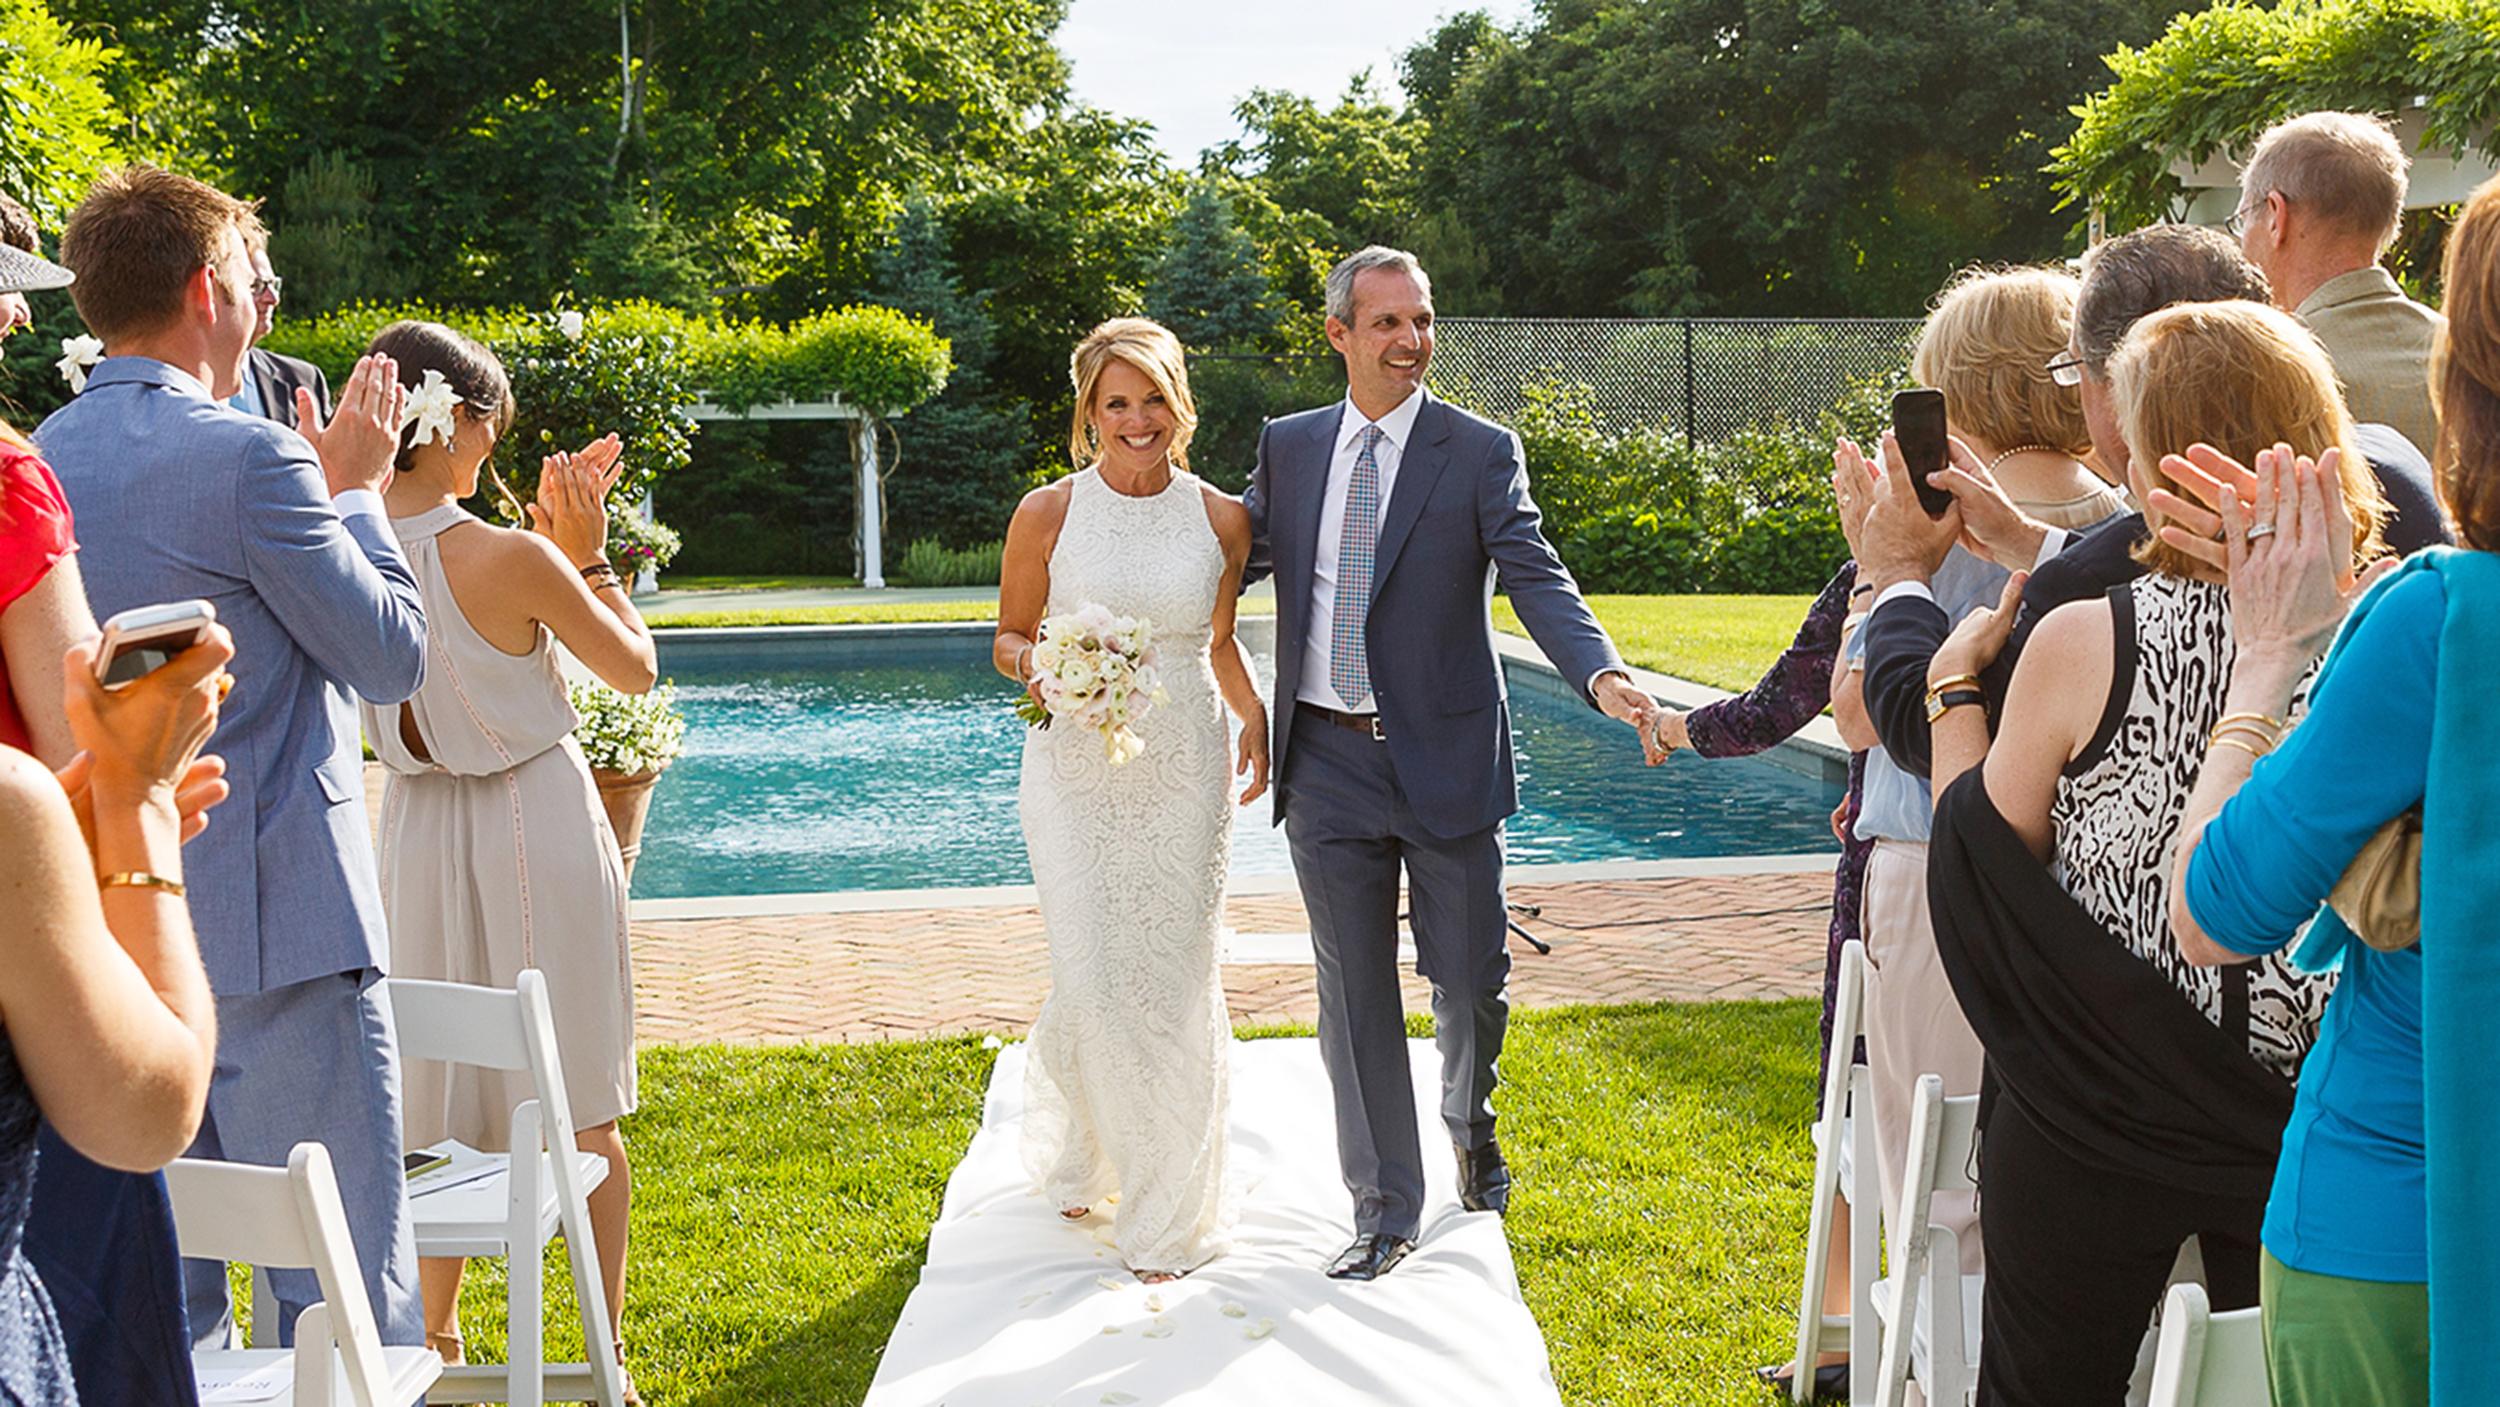 Katie Couric Shares Beautiful Backyard Wedding Pictures